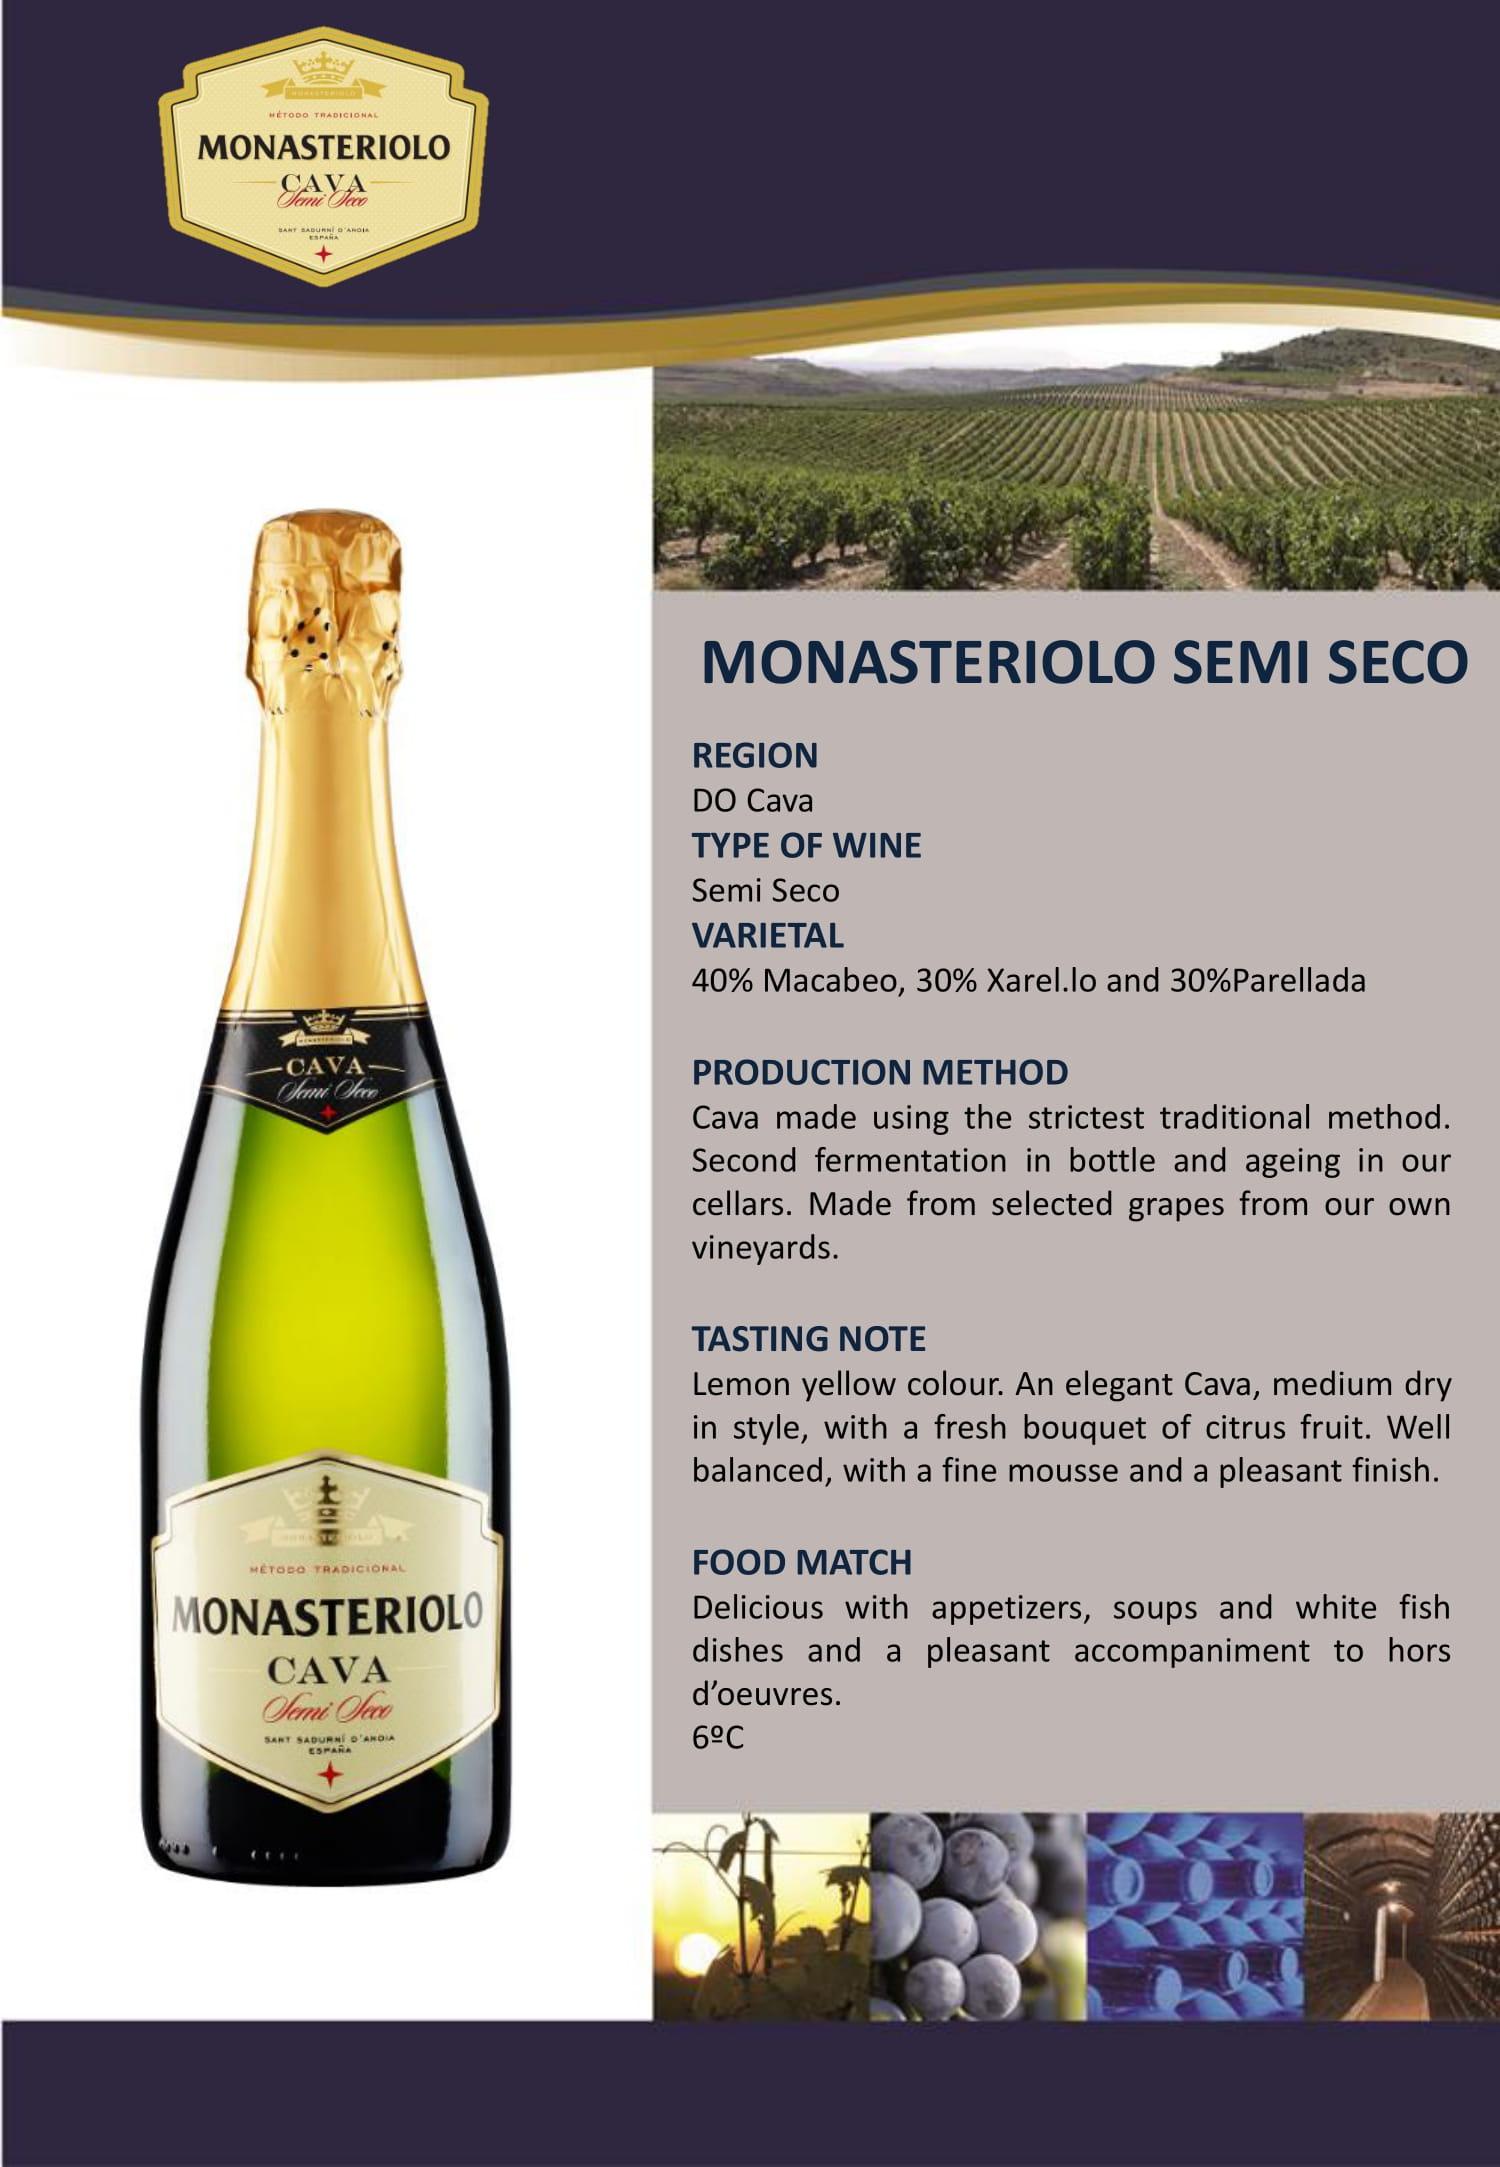 Monasteriolo Cava Semi Seco Tech Sheet